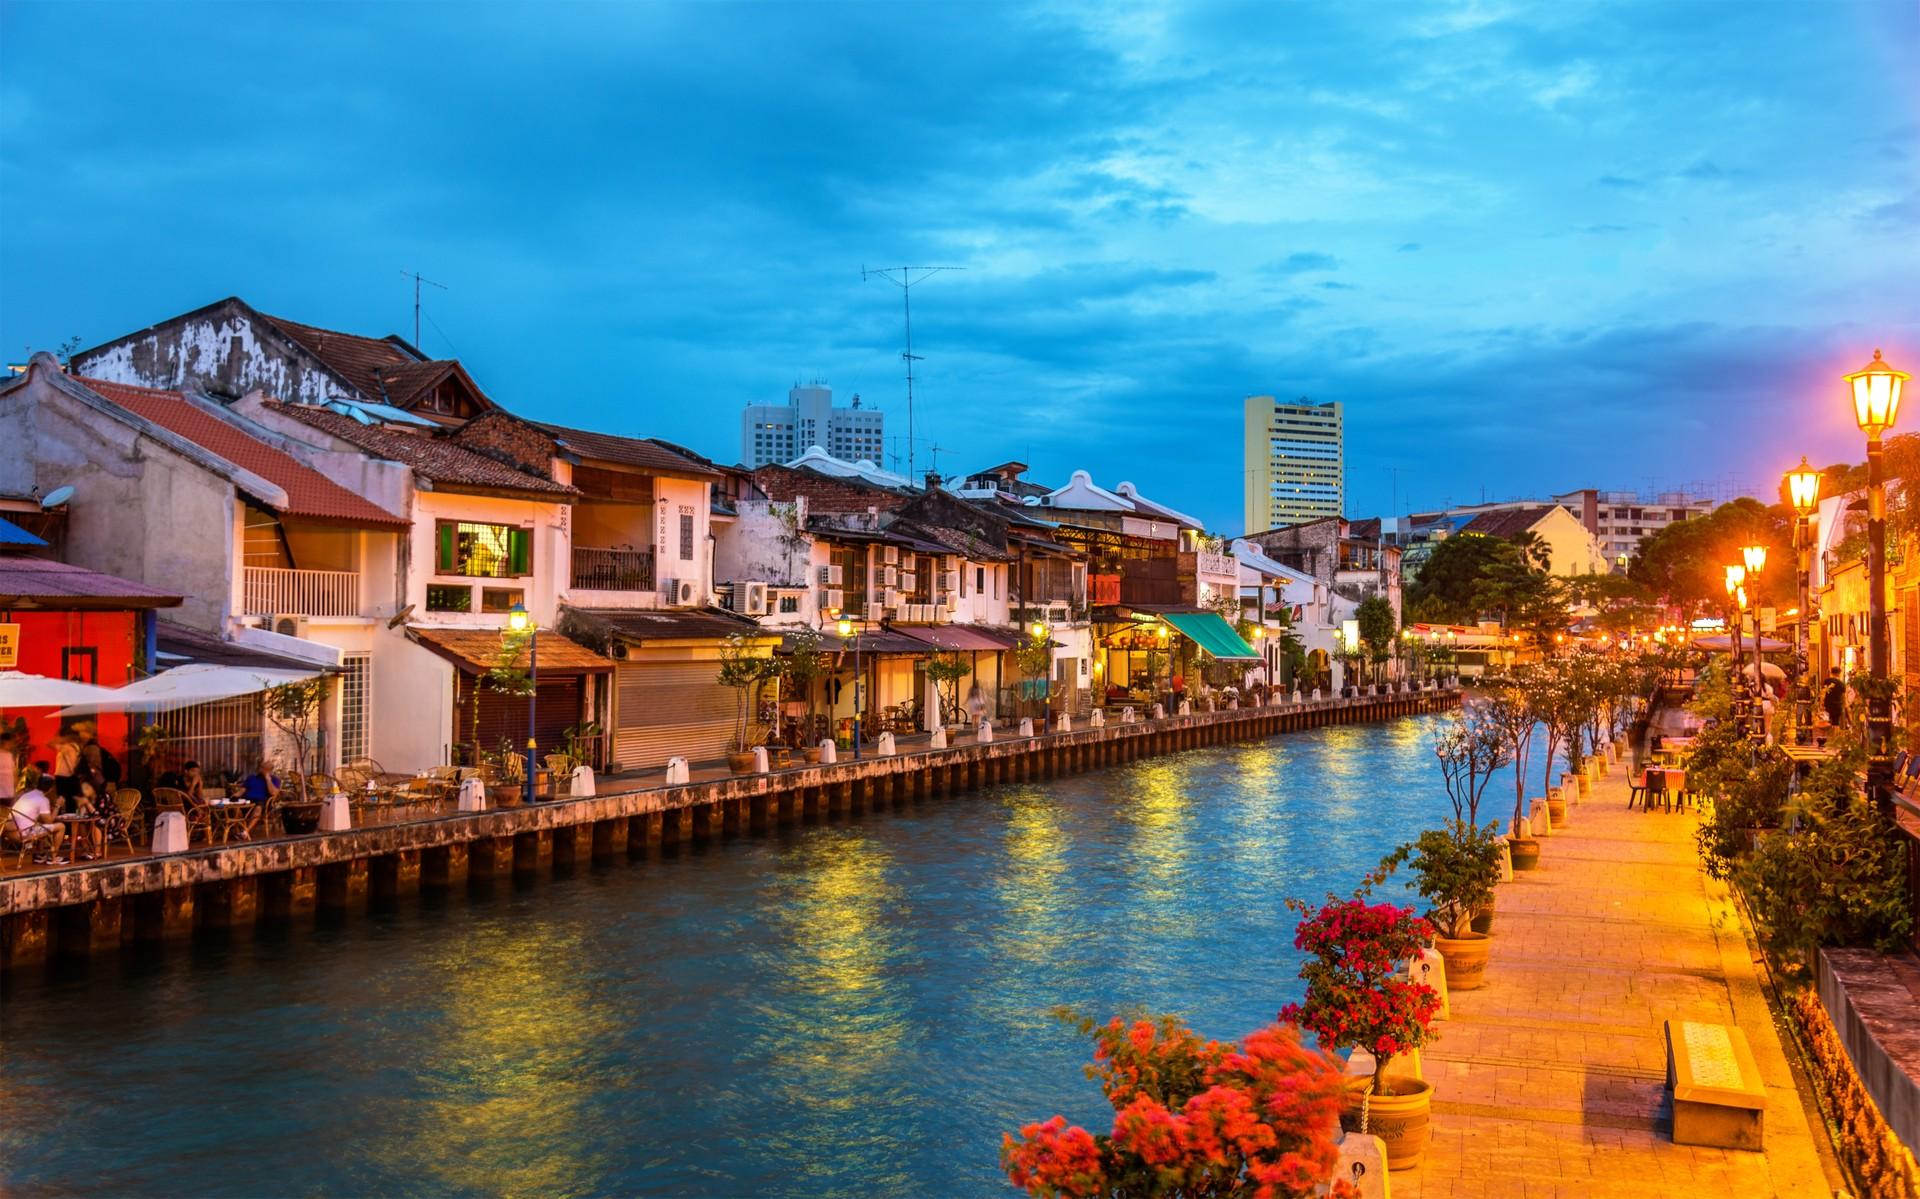 Old town of Malacca, Malaysia